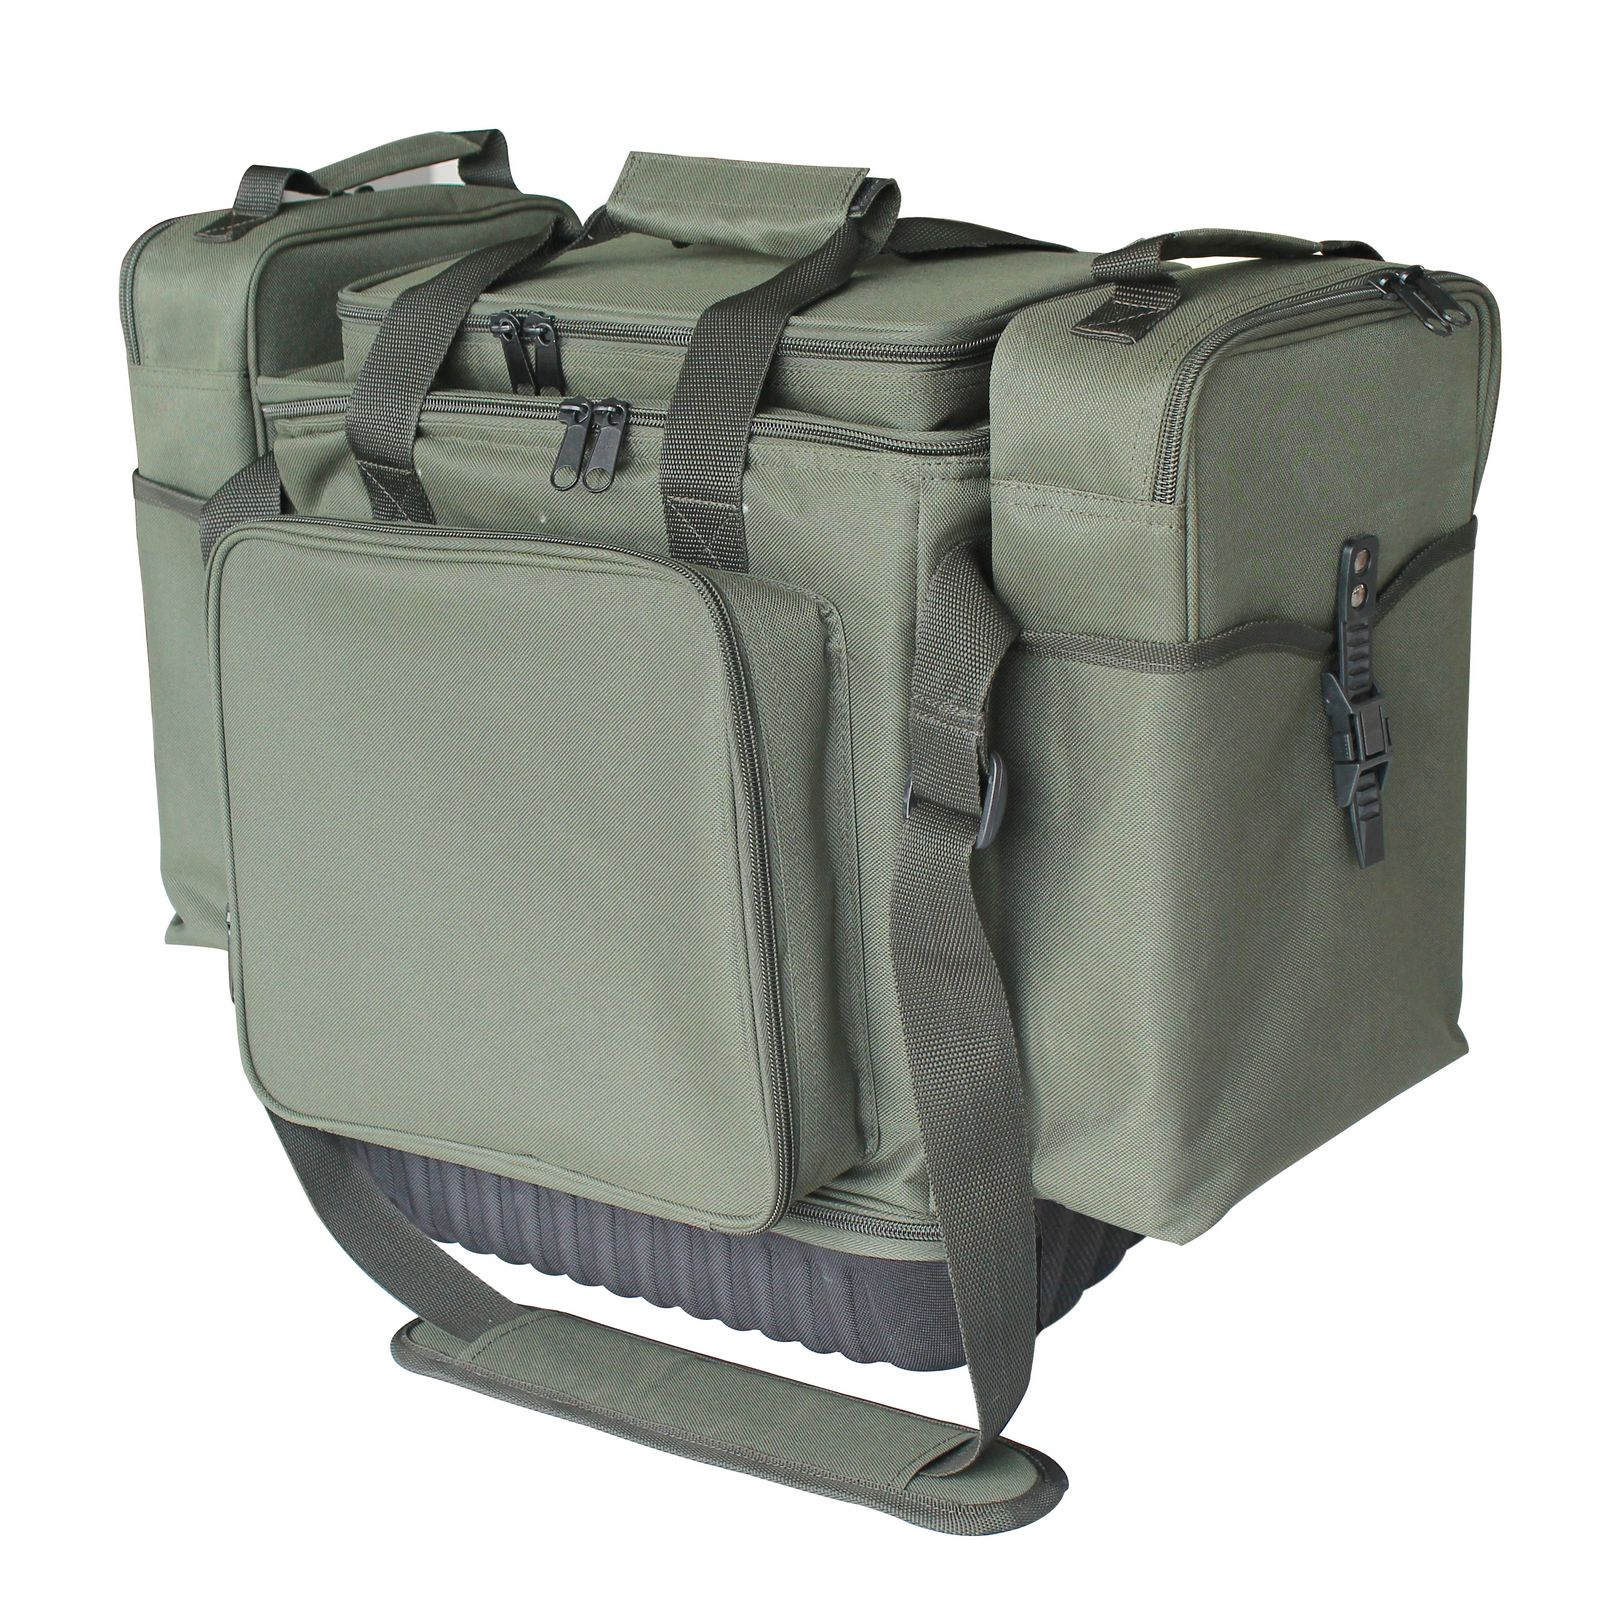 Foxhunter carp fishing integrated tackle rig box wallet for Rigged fishing backpack